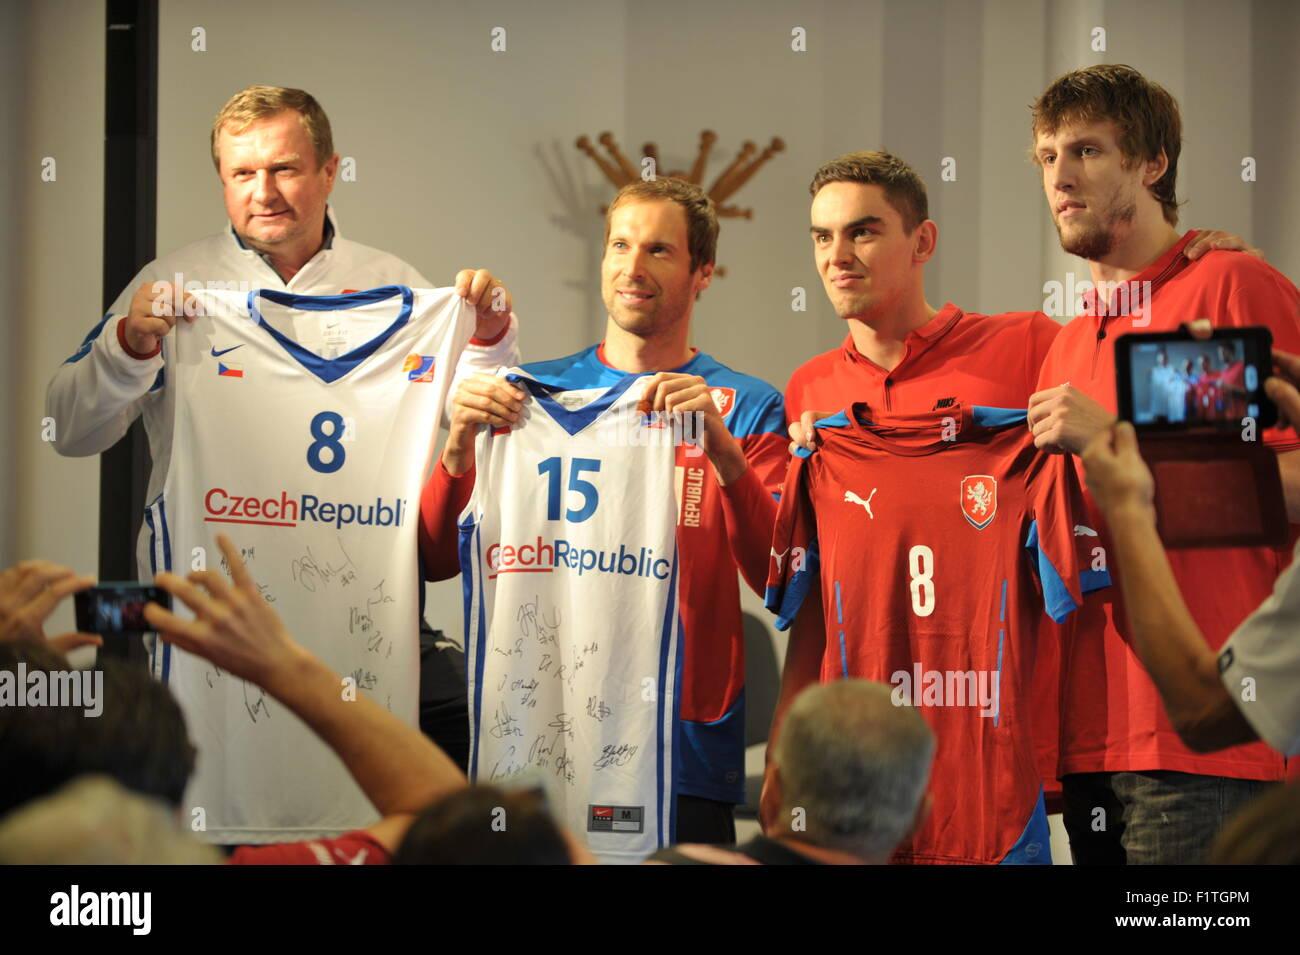 Czech Republic National Basketball team players Tomas Satoransky d2f3d0efb